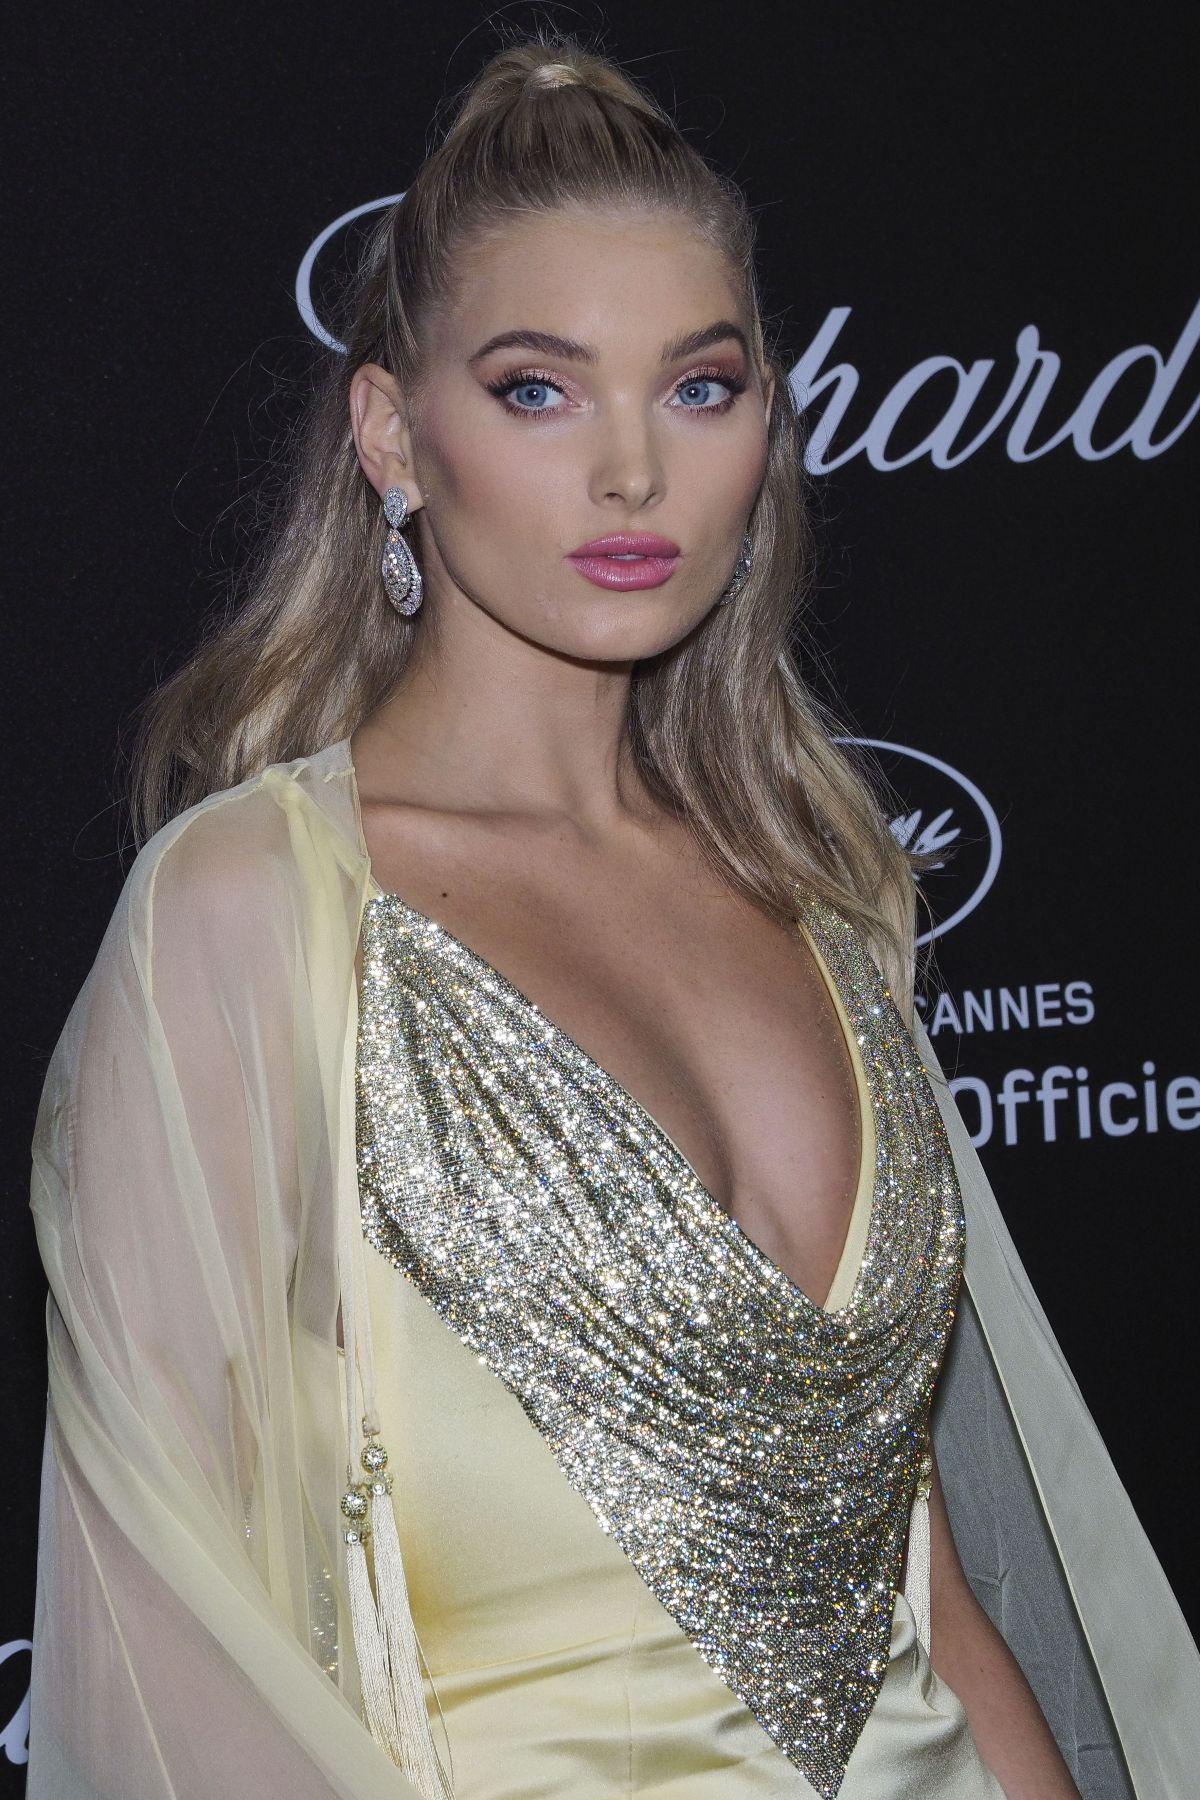 Elsa Hosk exudes the model glamour in plunging chiffon